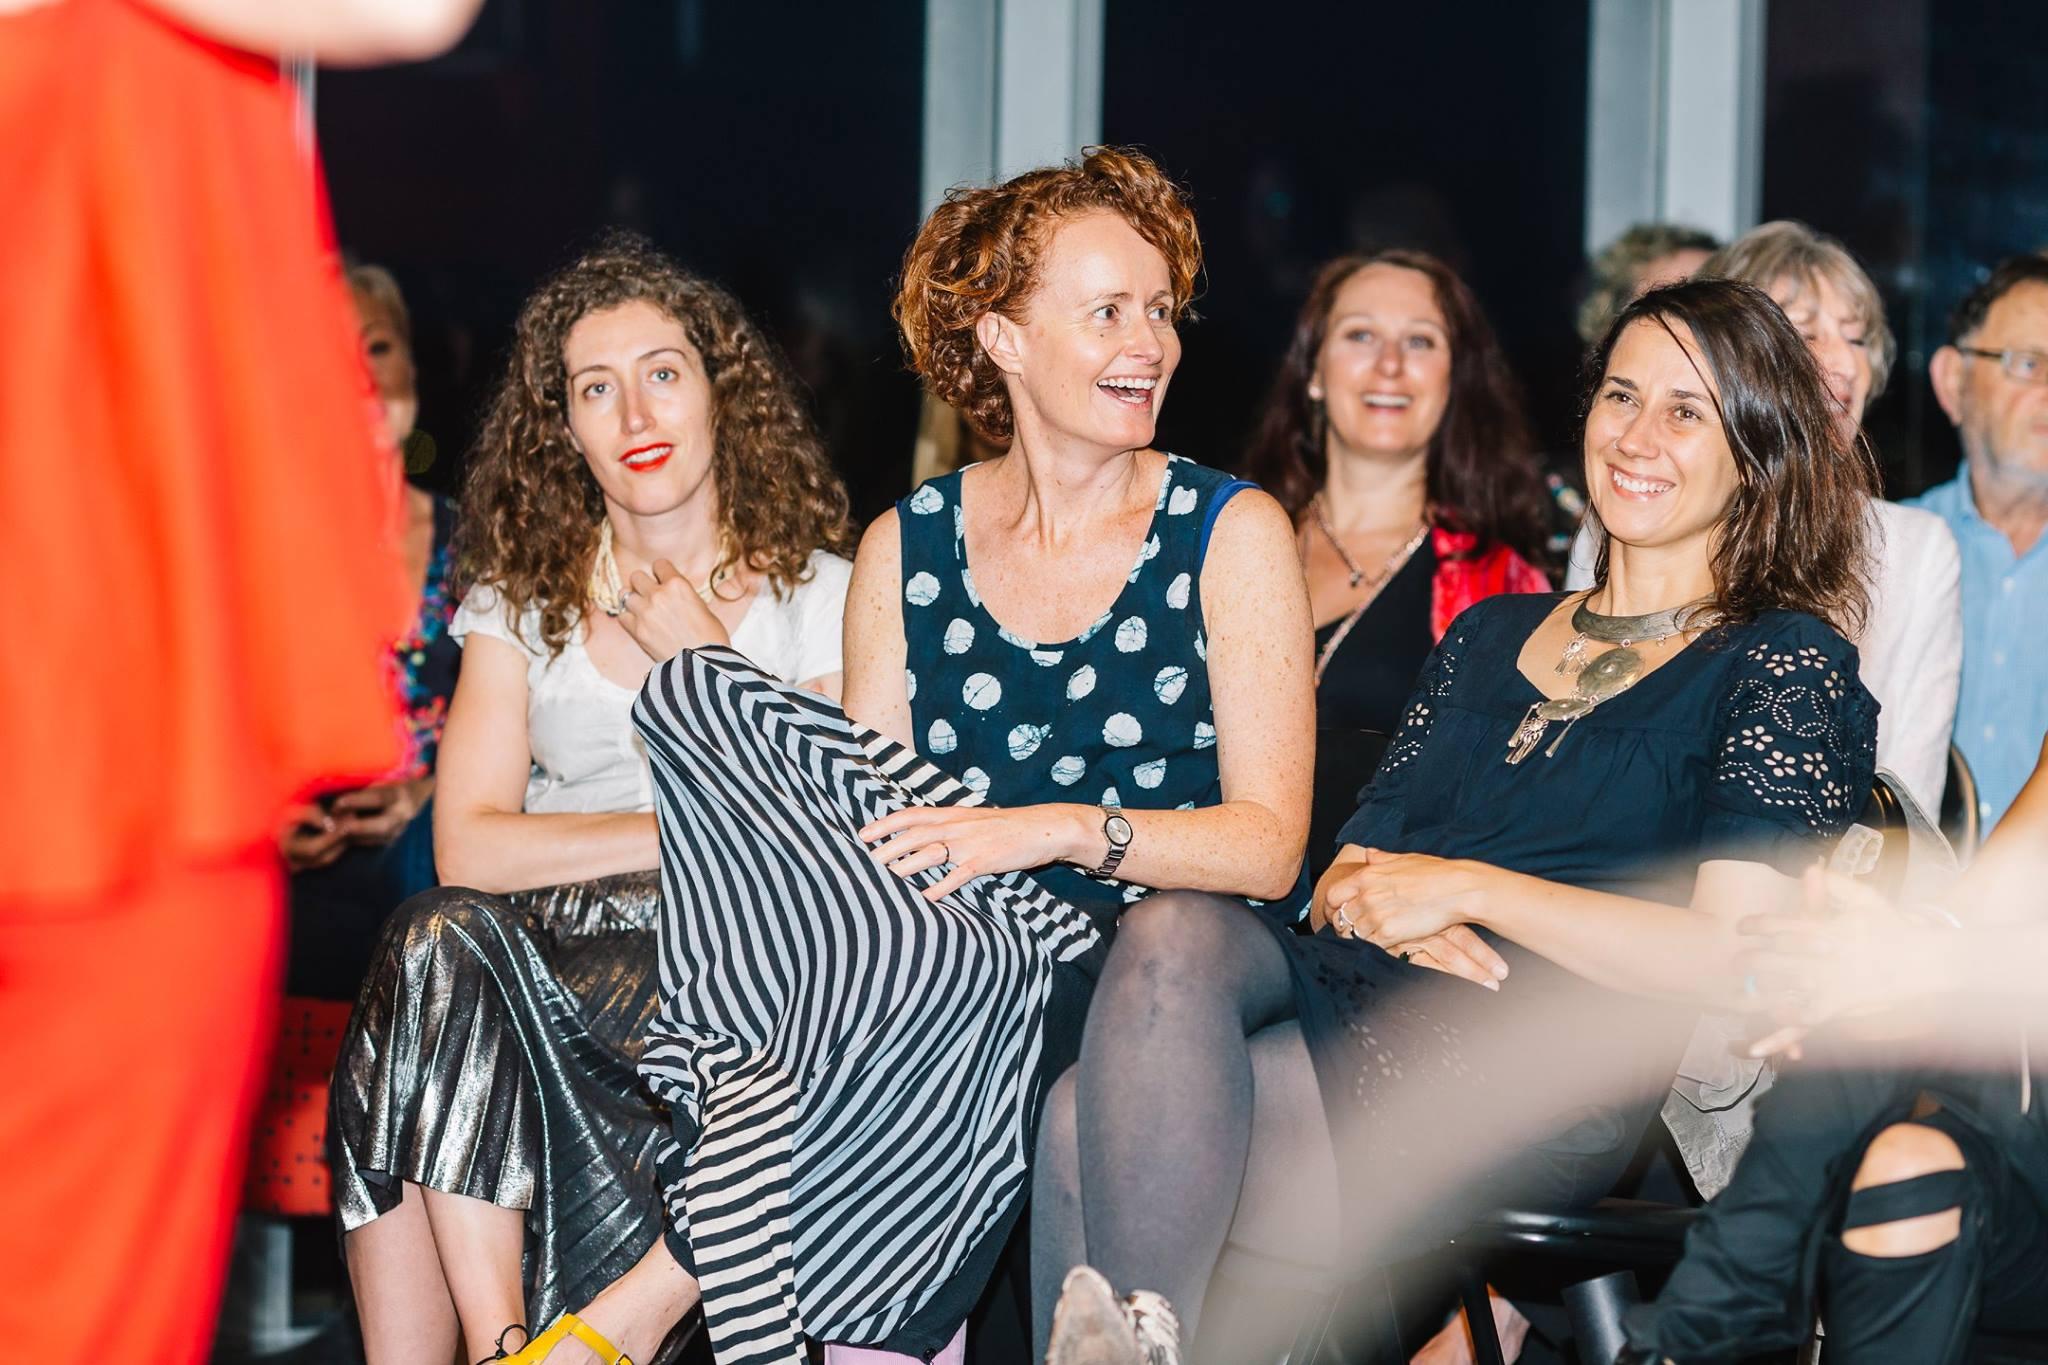 Enjoying the wonderful performance by AniKiko — with Ani Anikiko Malinova, Naomi Tarszisz, Natalie Rowland and Justine Armstrong at Aacta Bar.